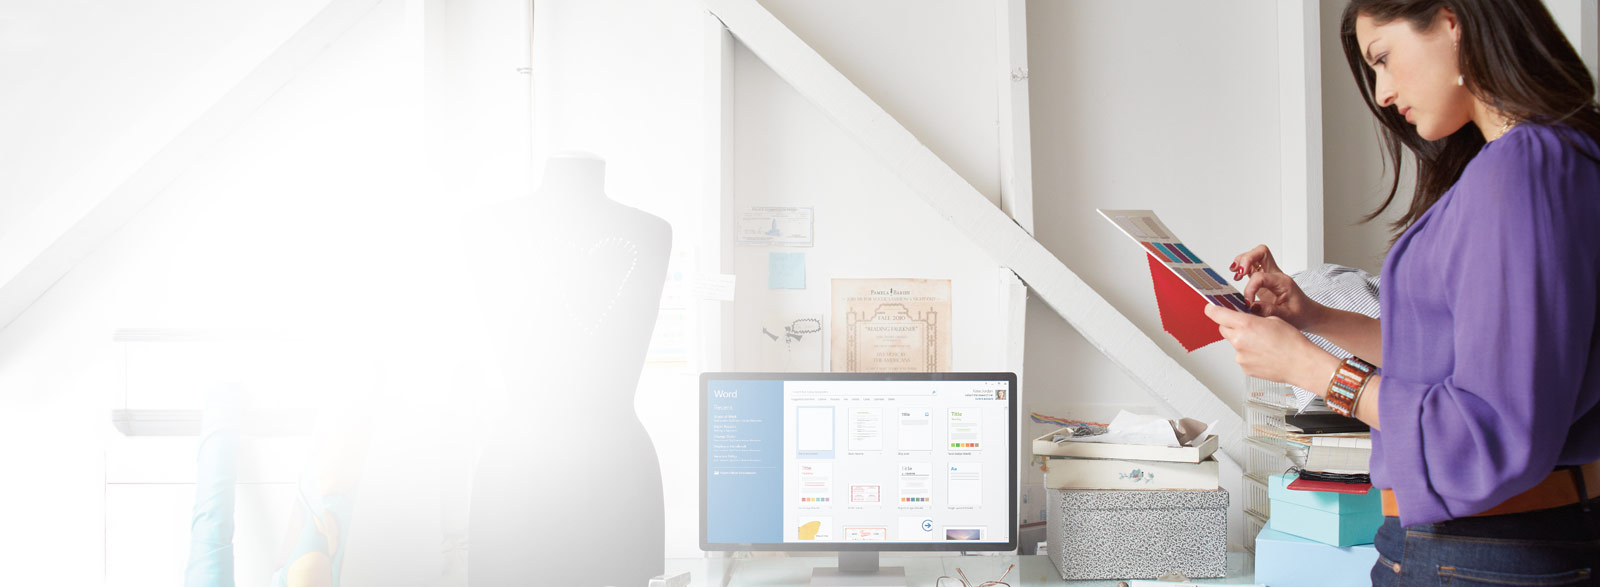 Office 365 Business: 여러 장치에서 파일 저장 및 공유를 비롯한 전체 Office 응용 프로그램을 사용해 보세요.